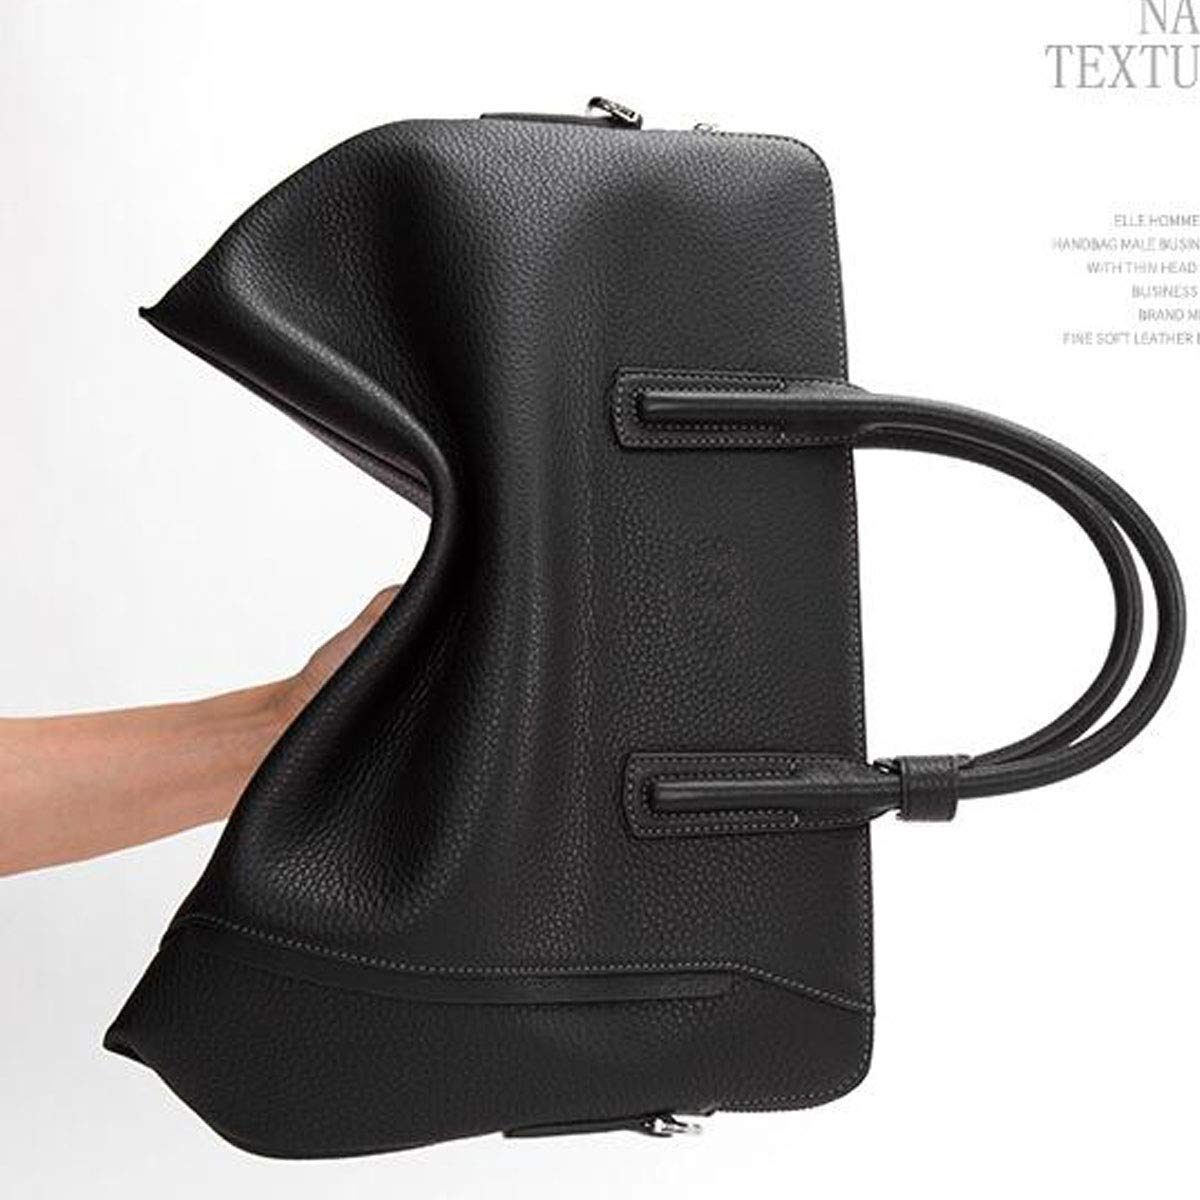 Black Size: 37.5627.5cm Top Leather Business Multi-function Computer Bag Mens Large-capacity Handbag Briefcase